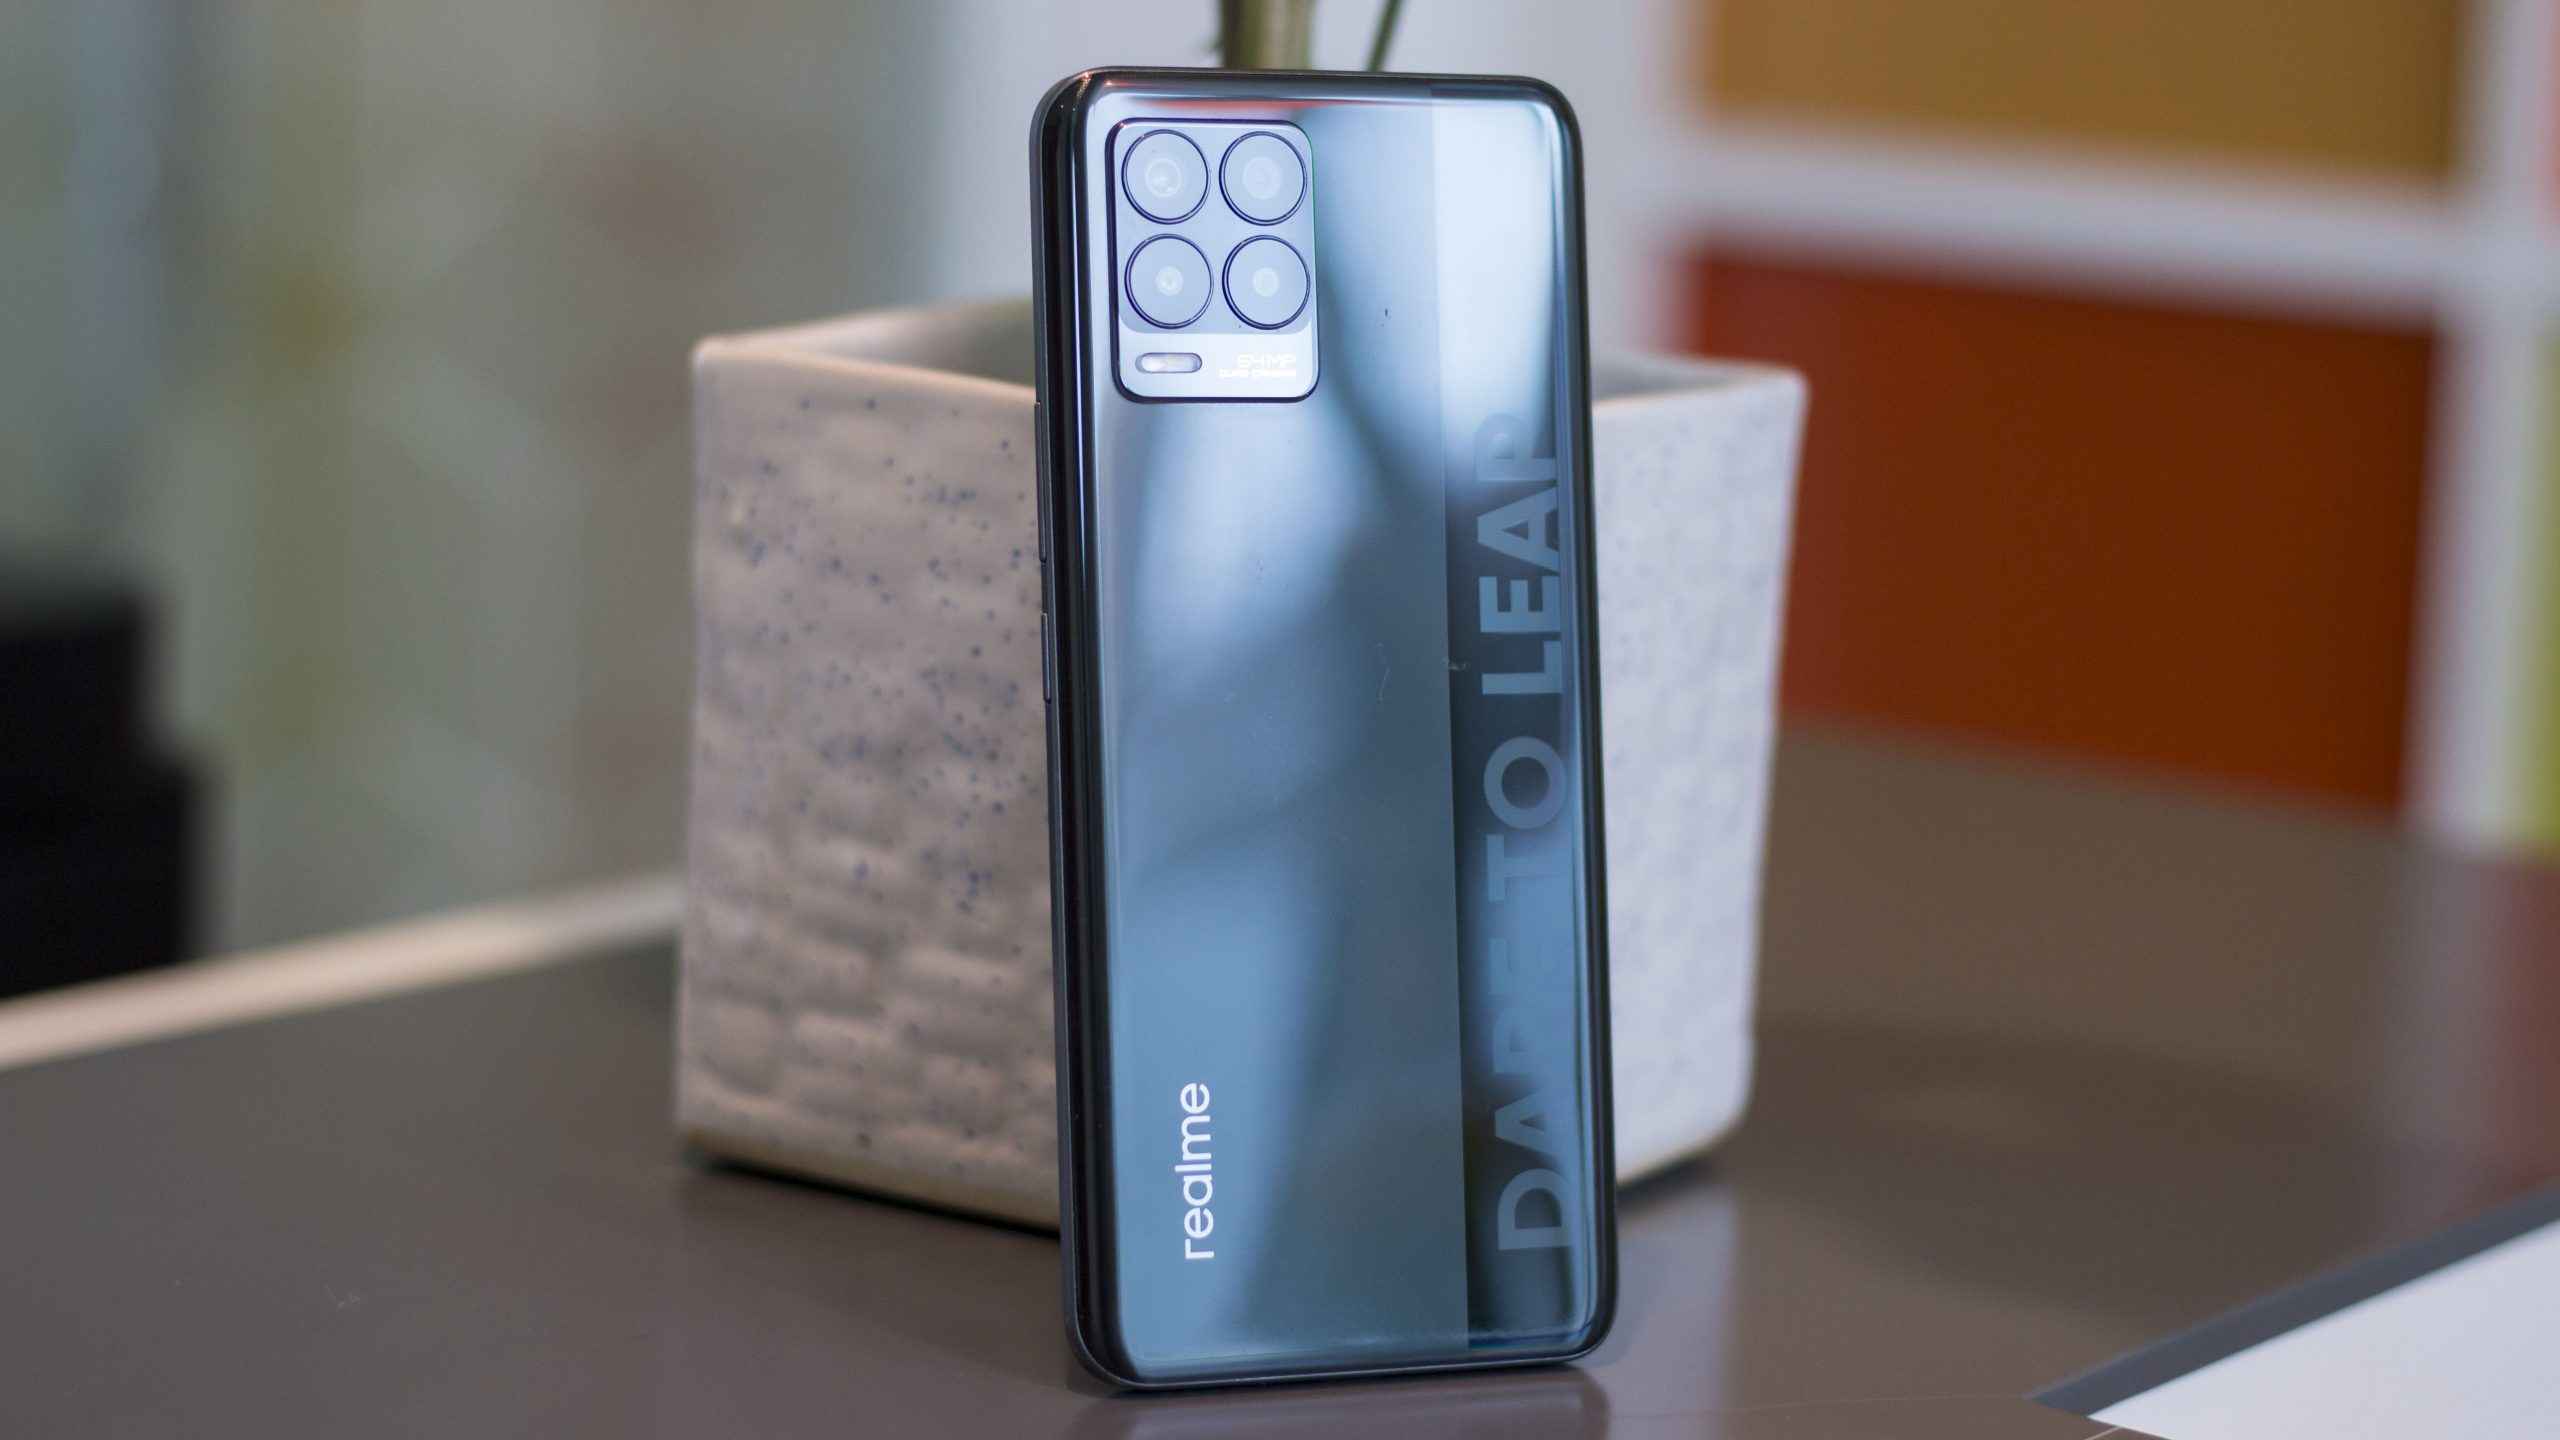 Realme 8 , Realme 8 Cam ,Realme 8 Camera test,Realme 8 Screen Repair, Realme 8 Camera, Realme 8 Unboxing, Realme 8 Hands-on